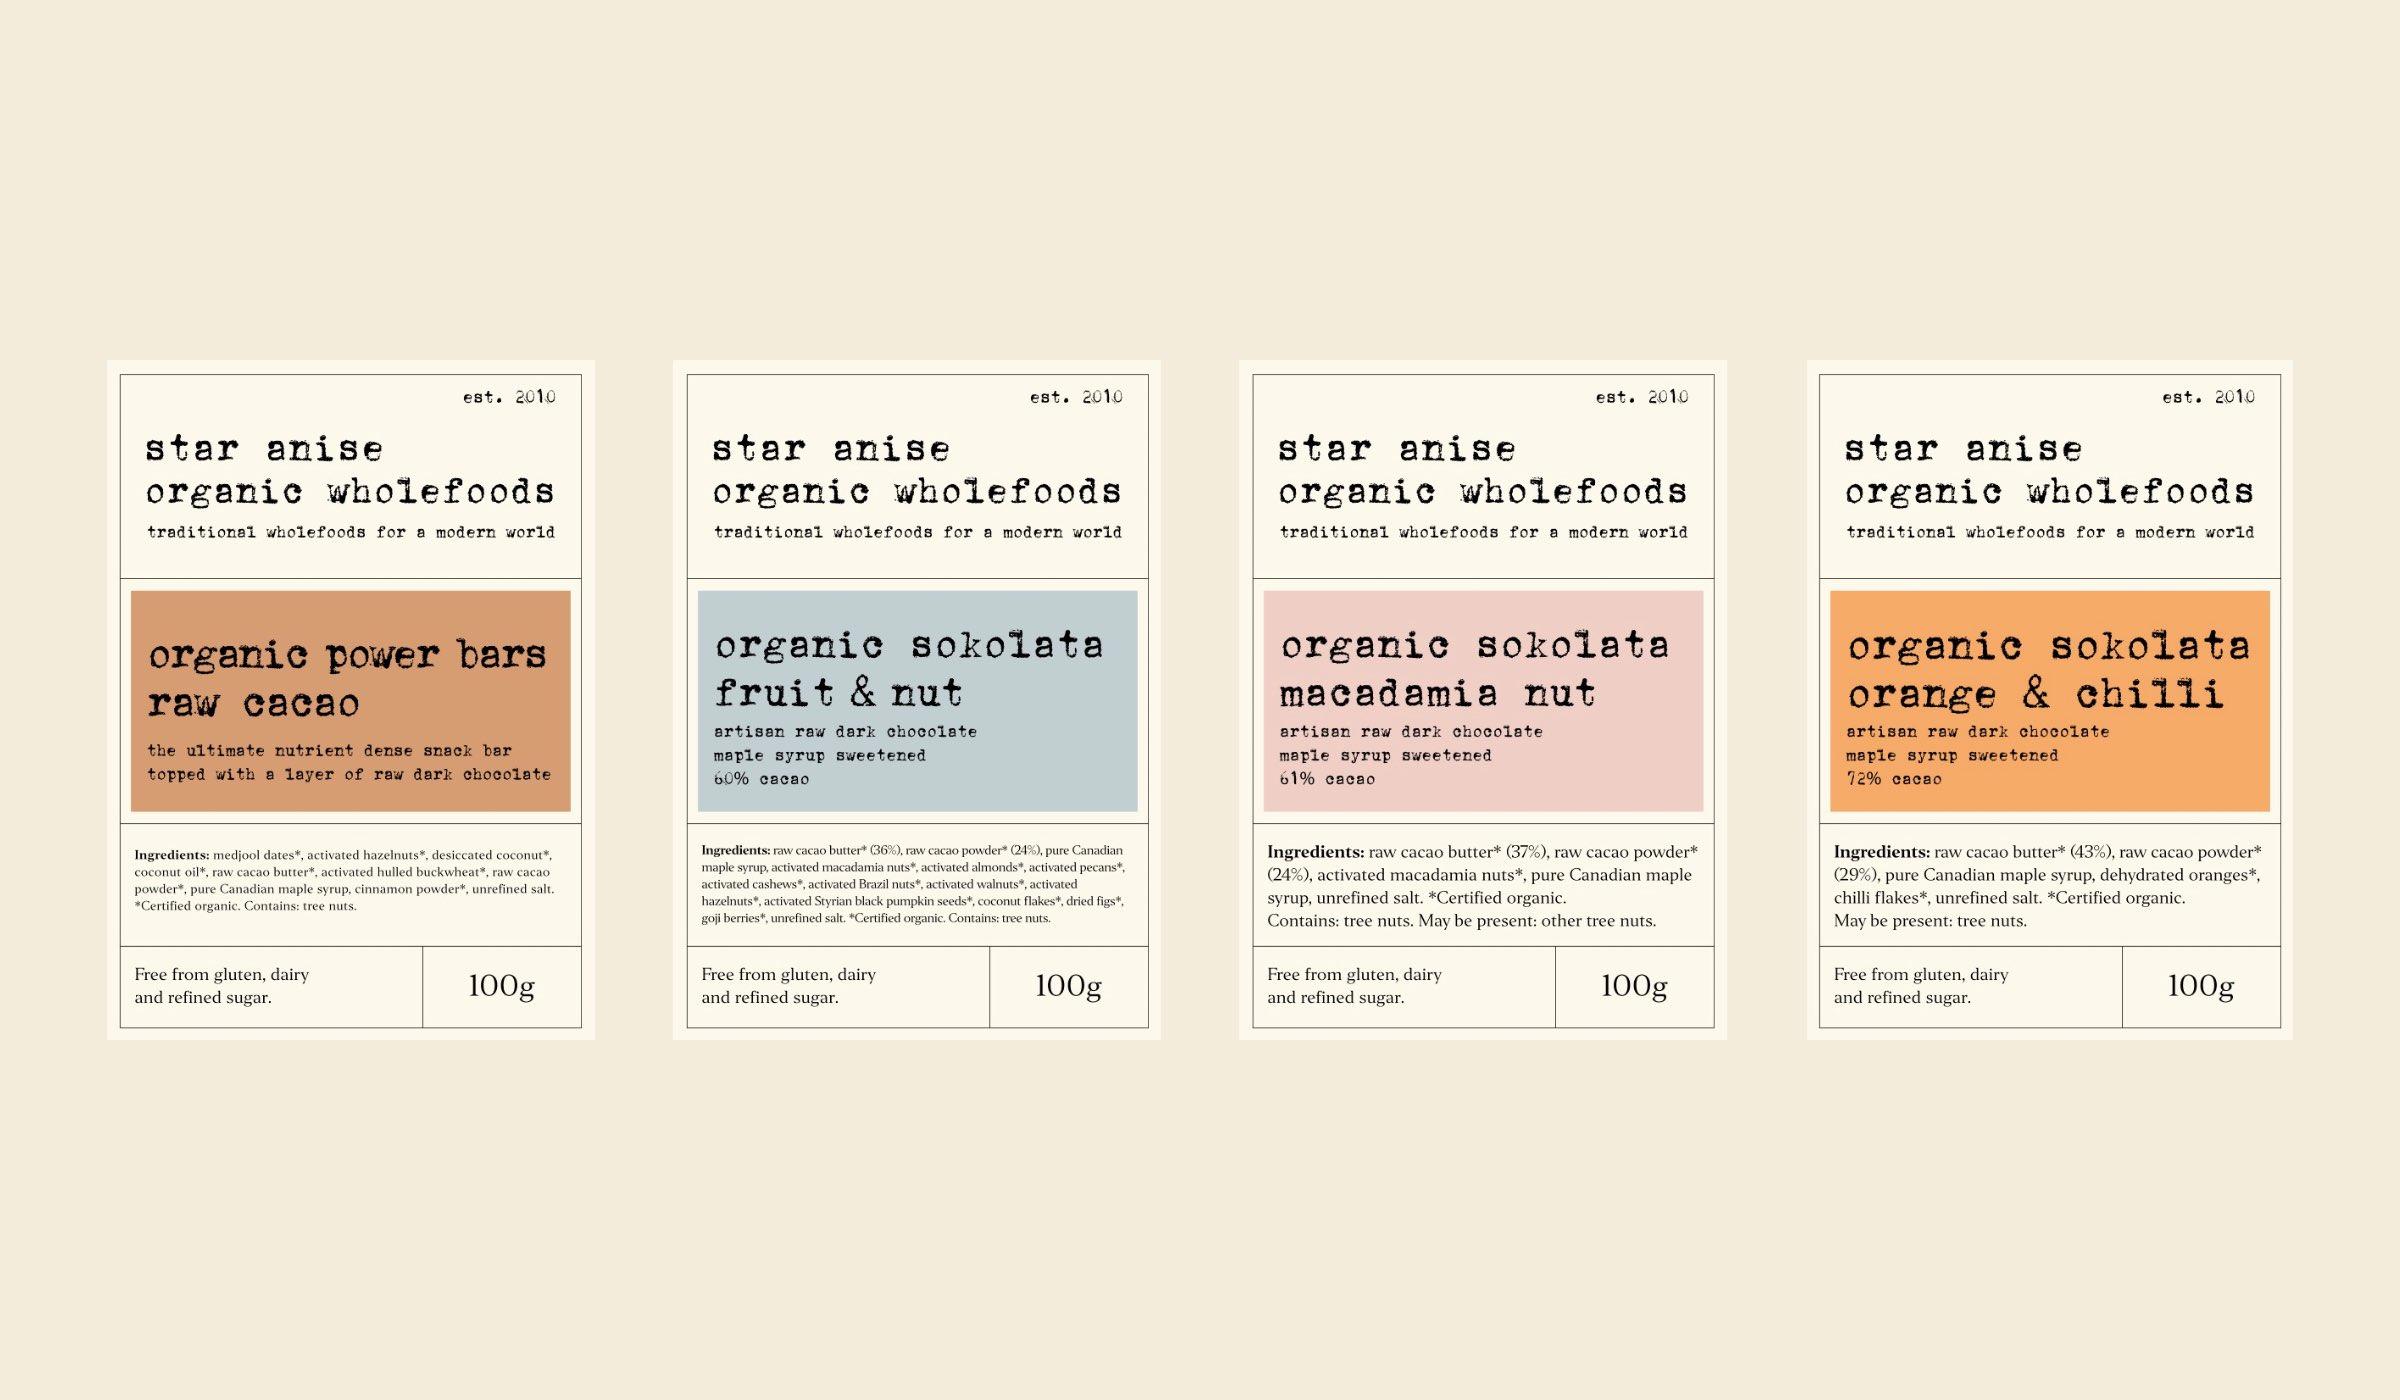 Star Anise Organics label designs